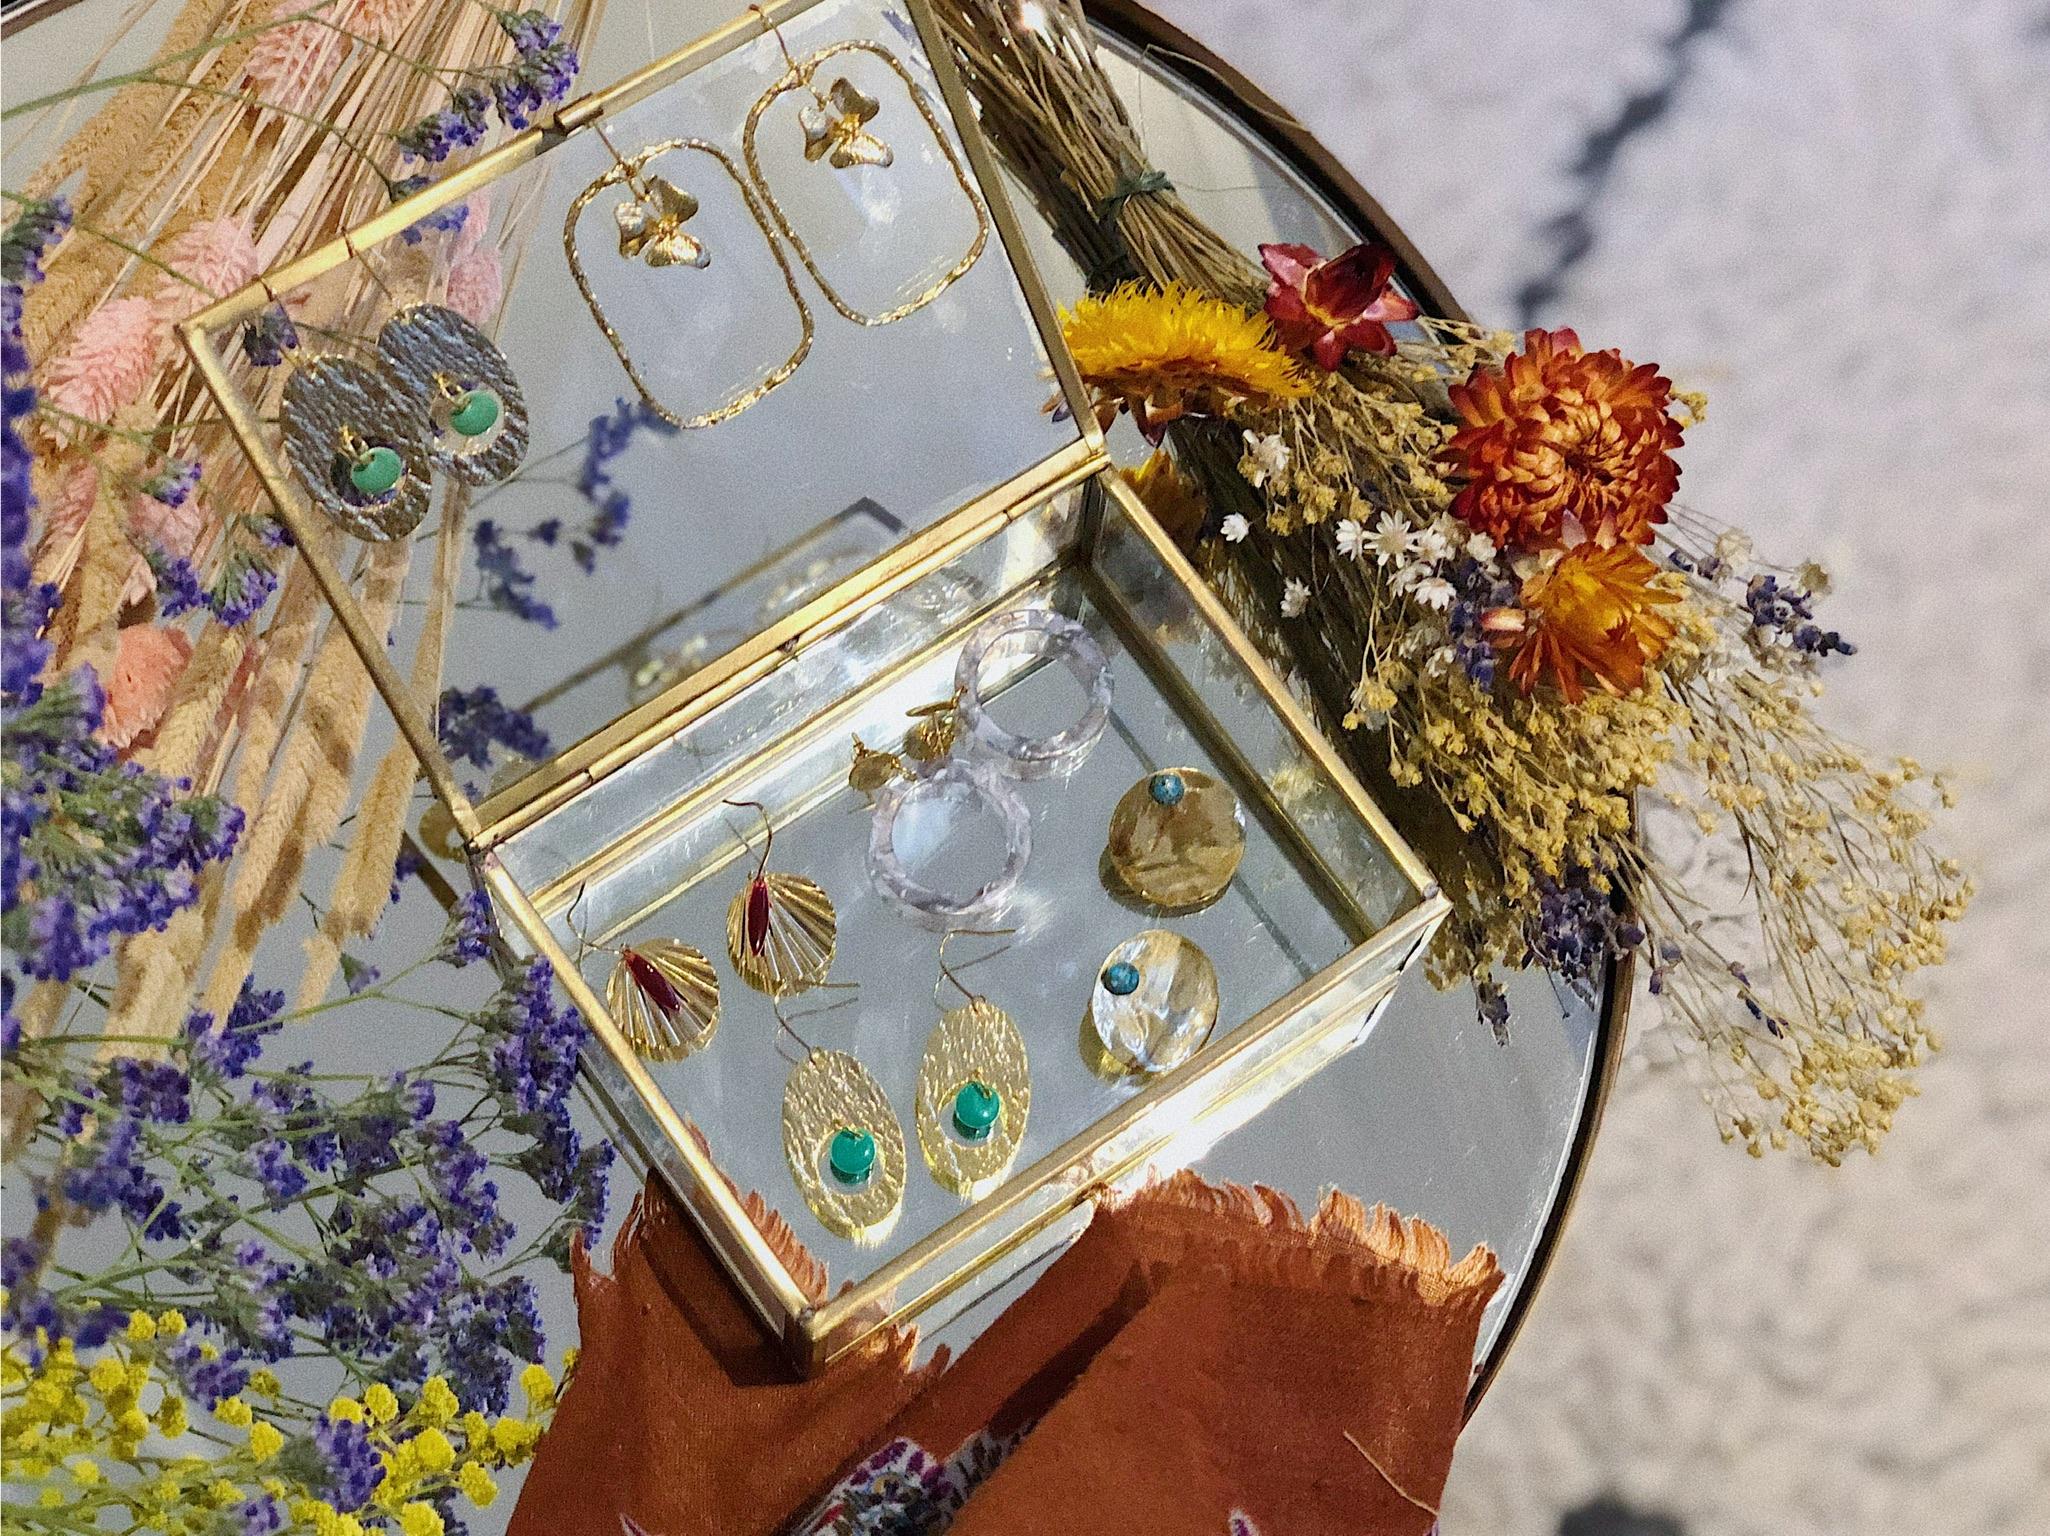 Dimanche matin, des bijoux made in 20e arrondissement